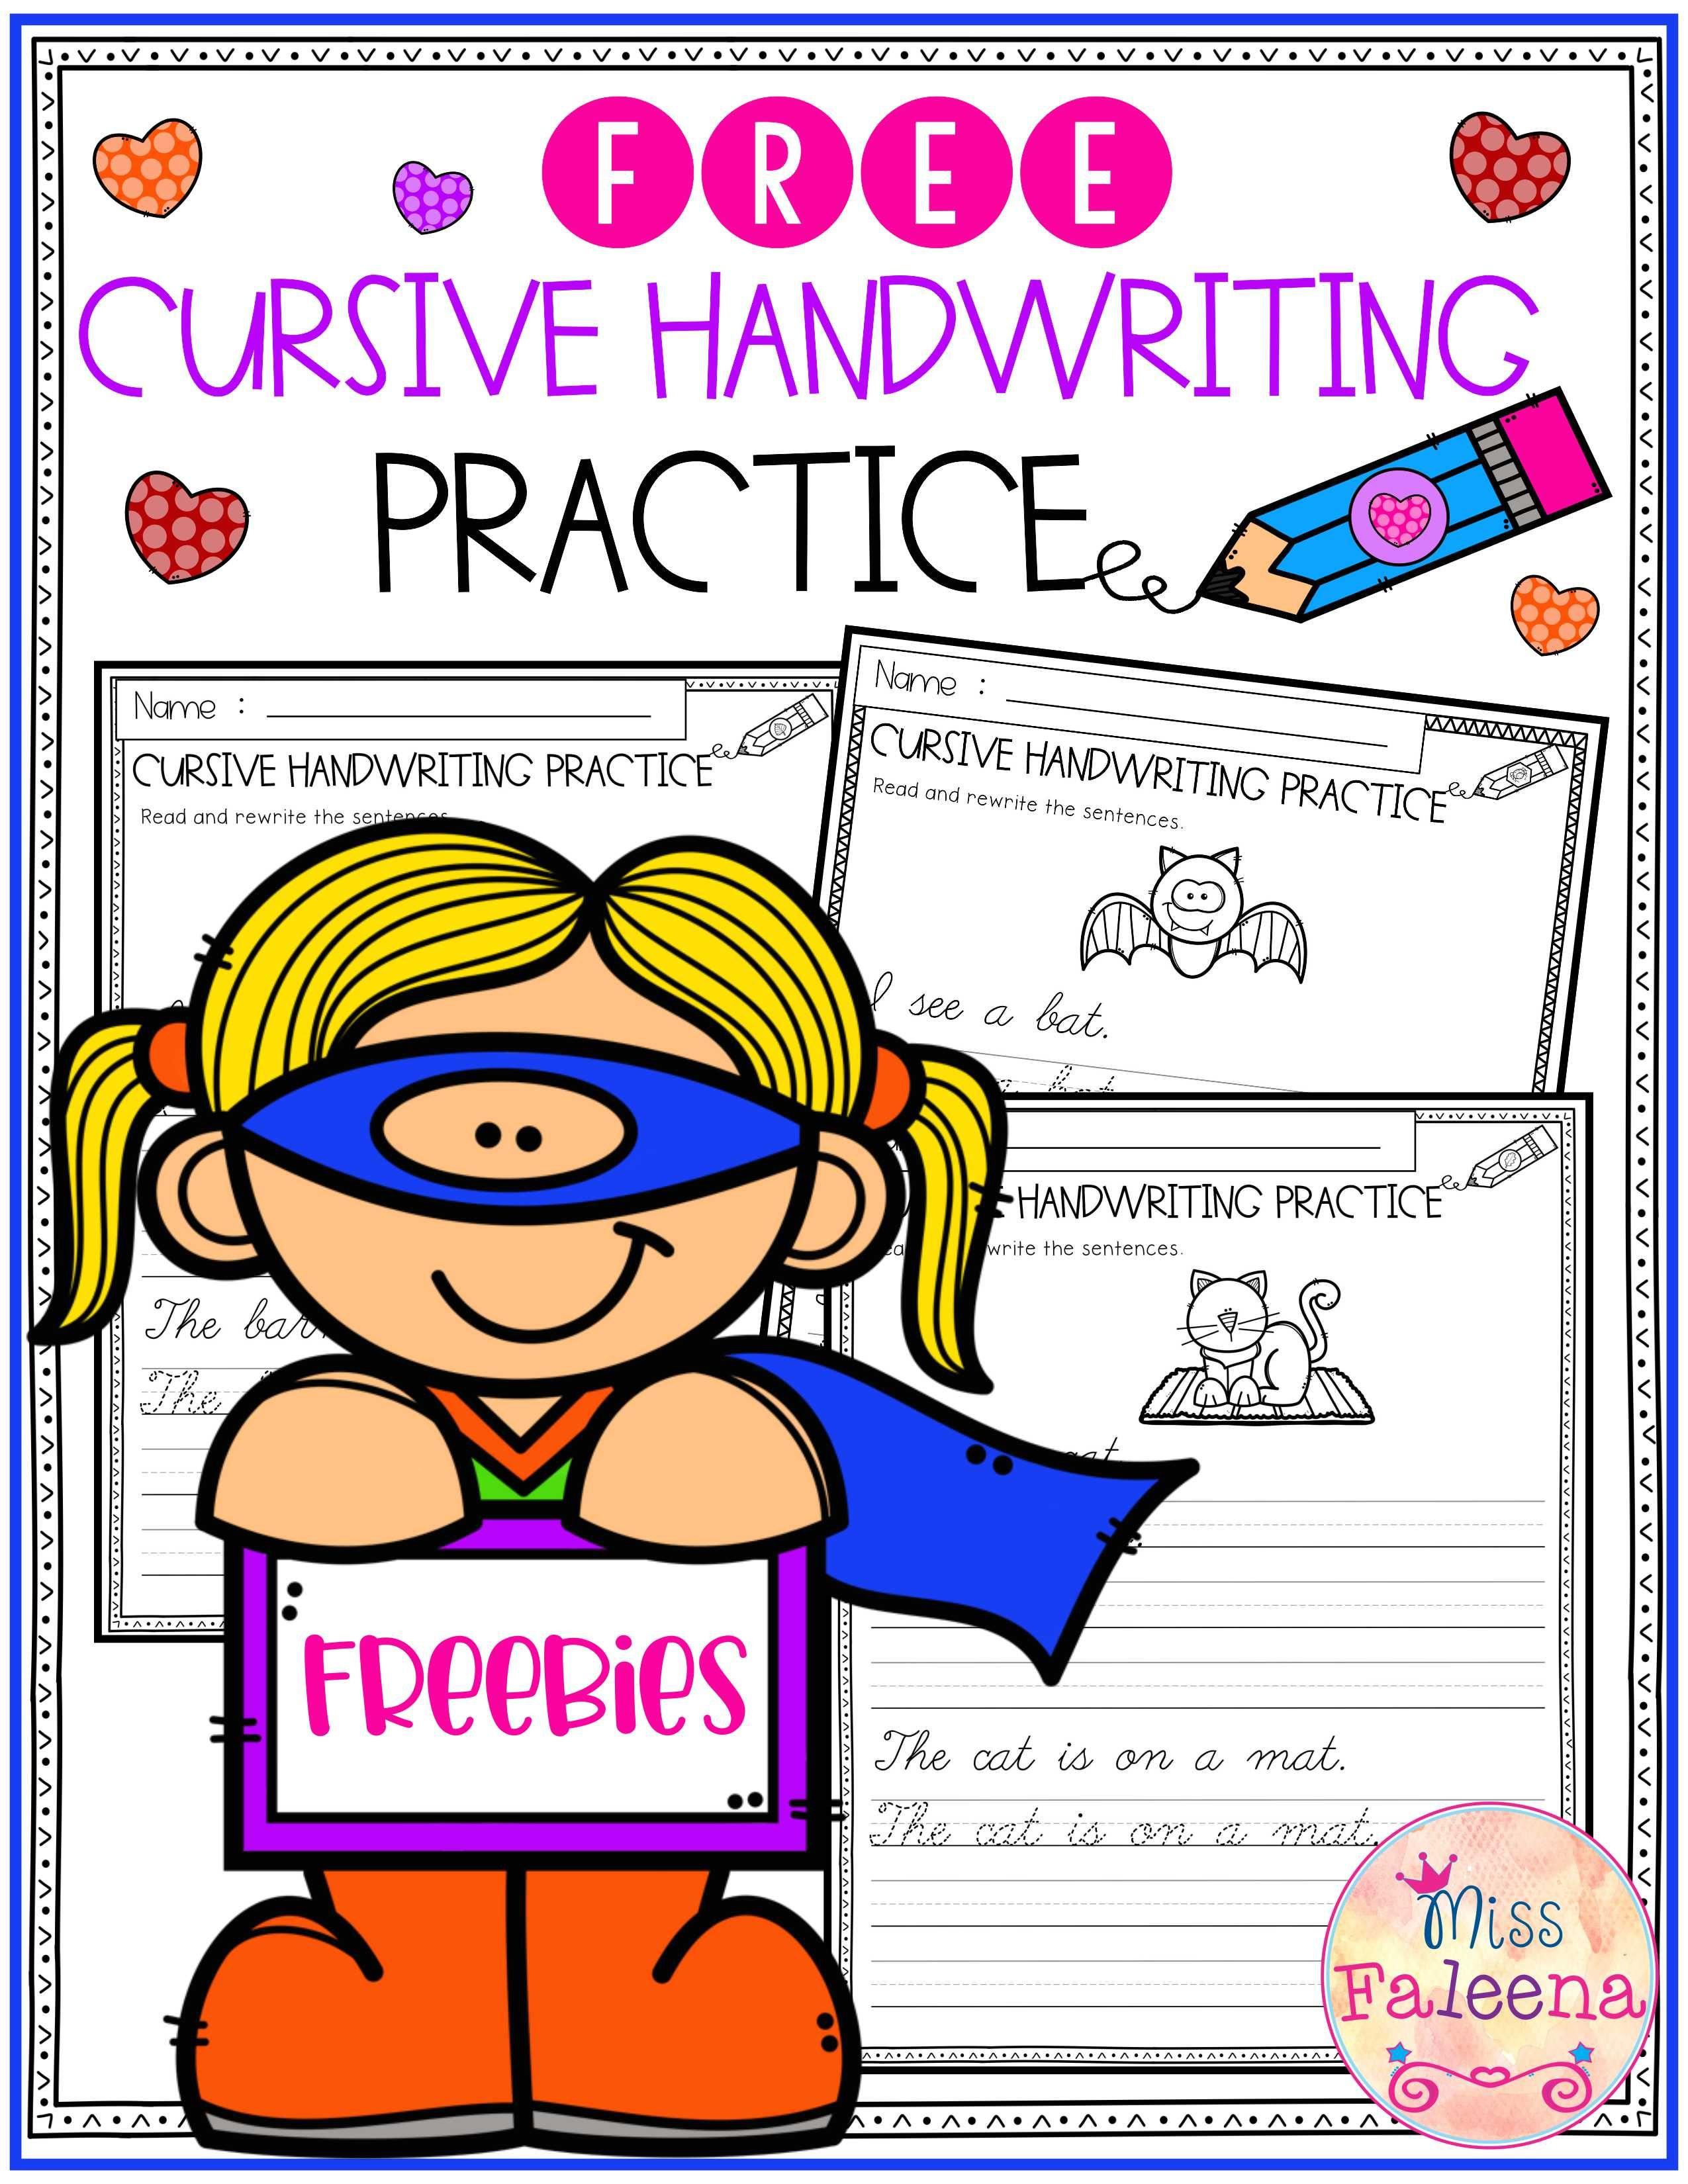 Free Cursive Handwriting Practice